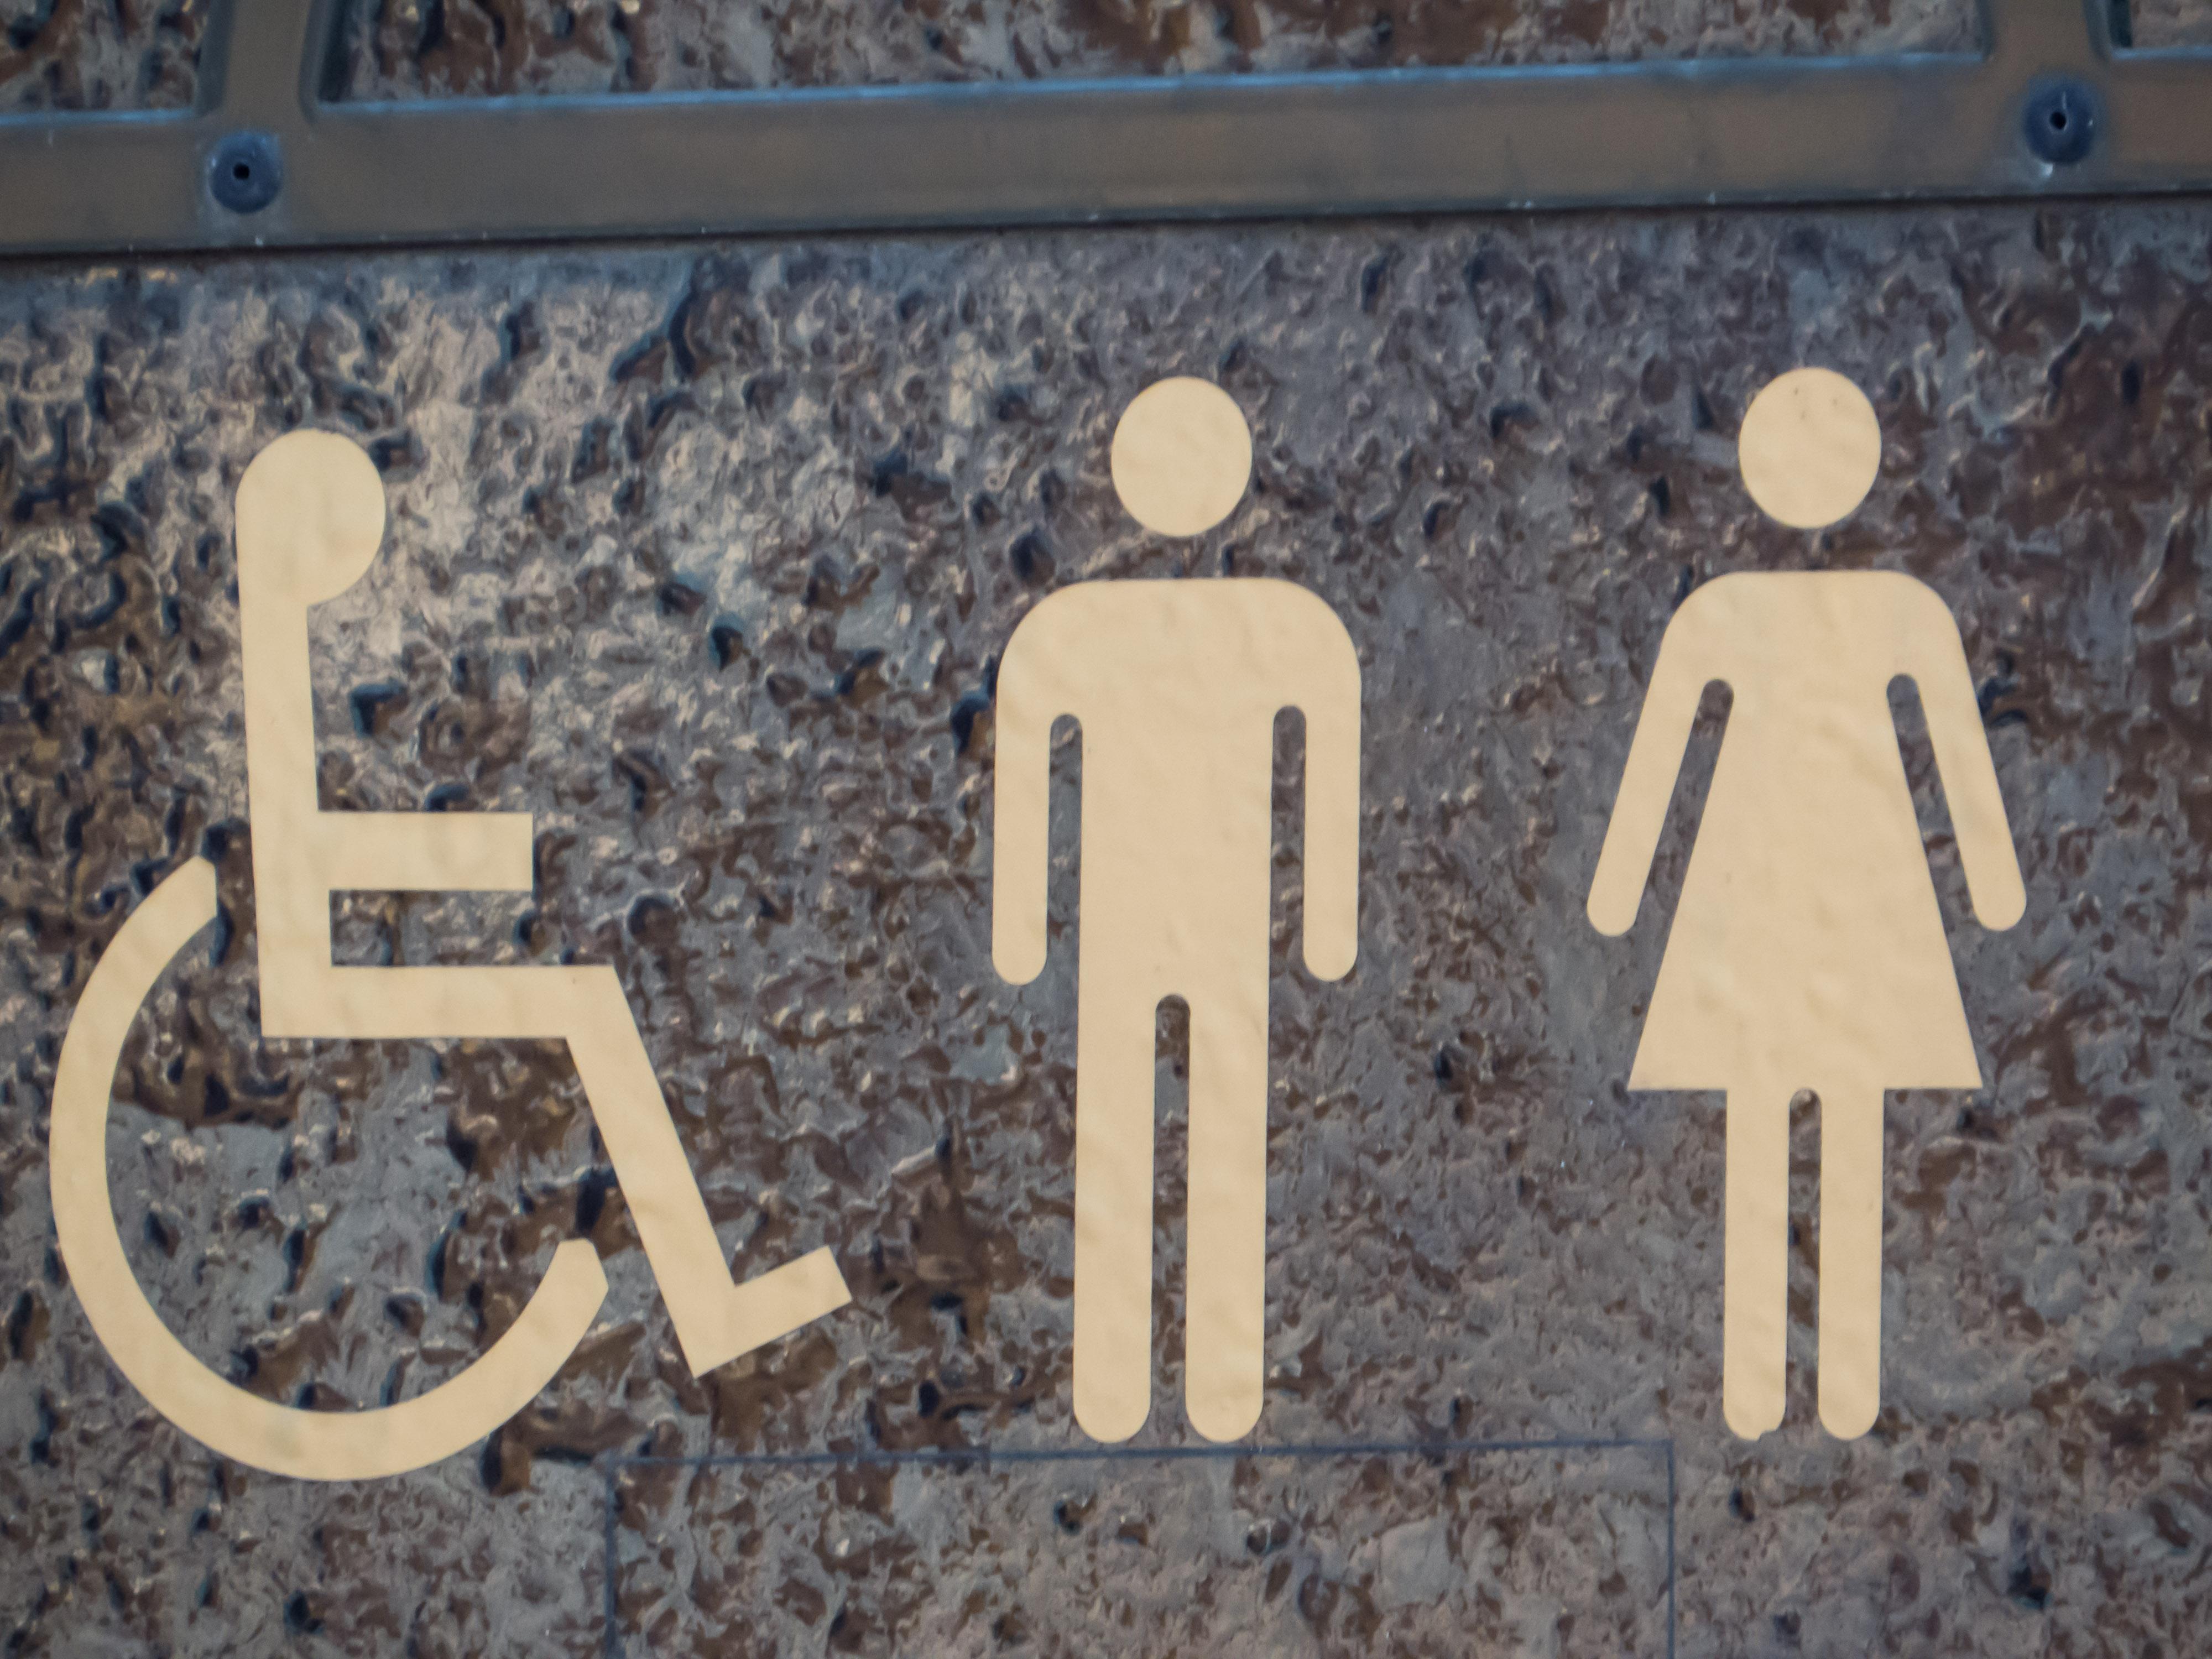 Toilet sign, Board, Lavatory, Mark, New, HQ Photo